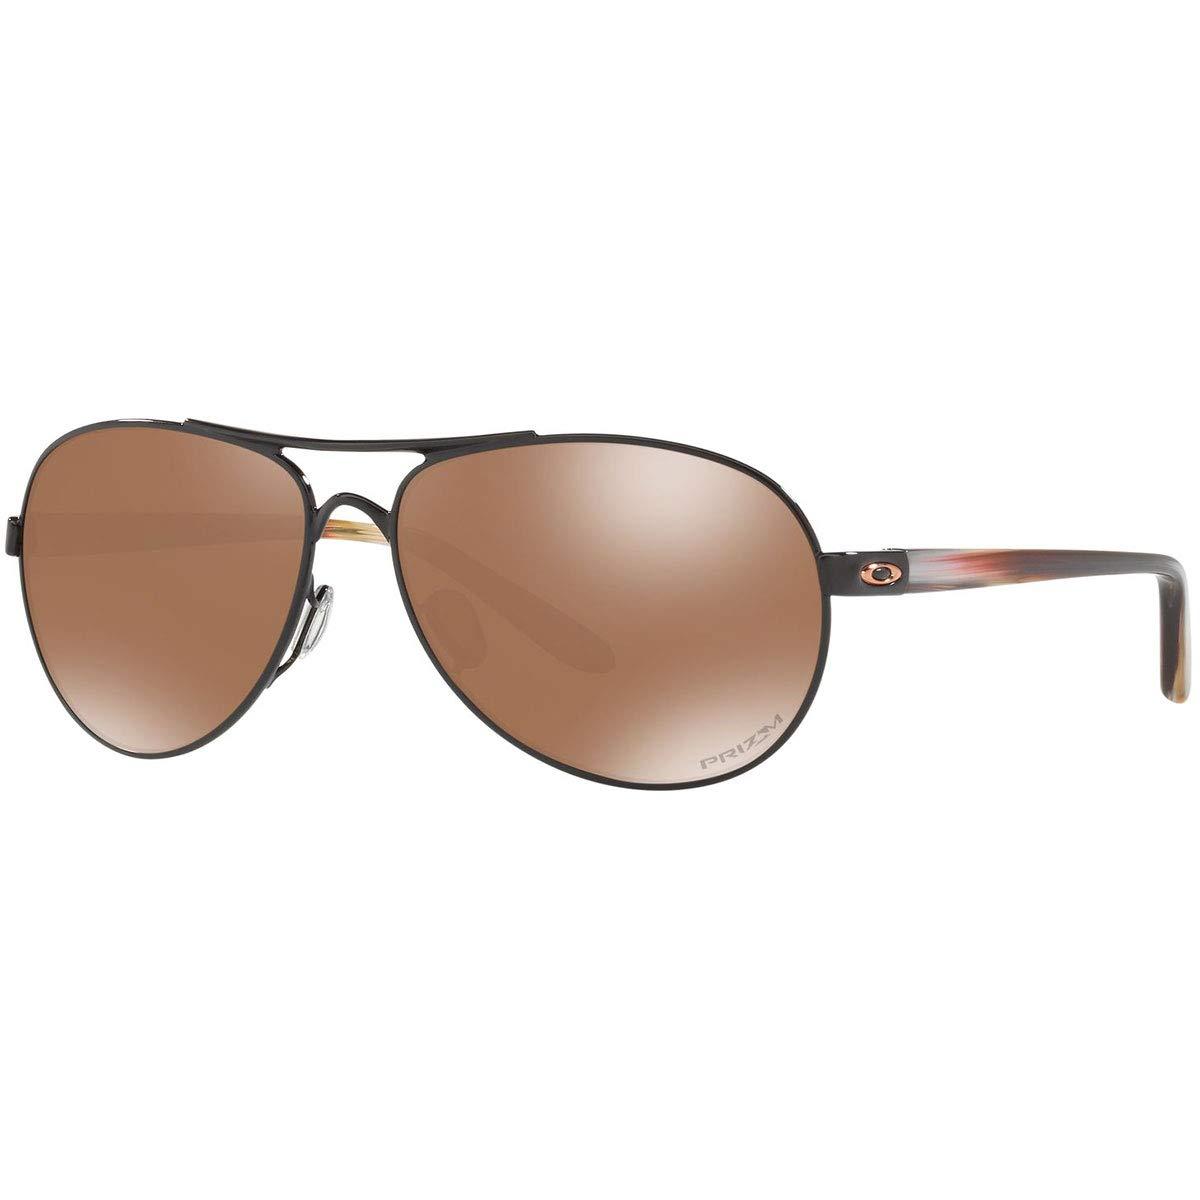 0b93450452 Amazon.com  Oakley Women s Feedback Sunglasses